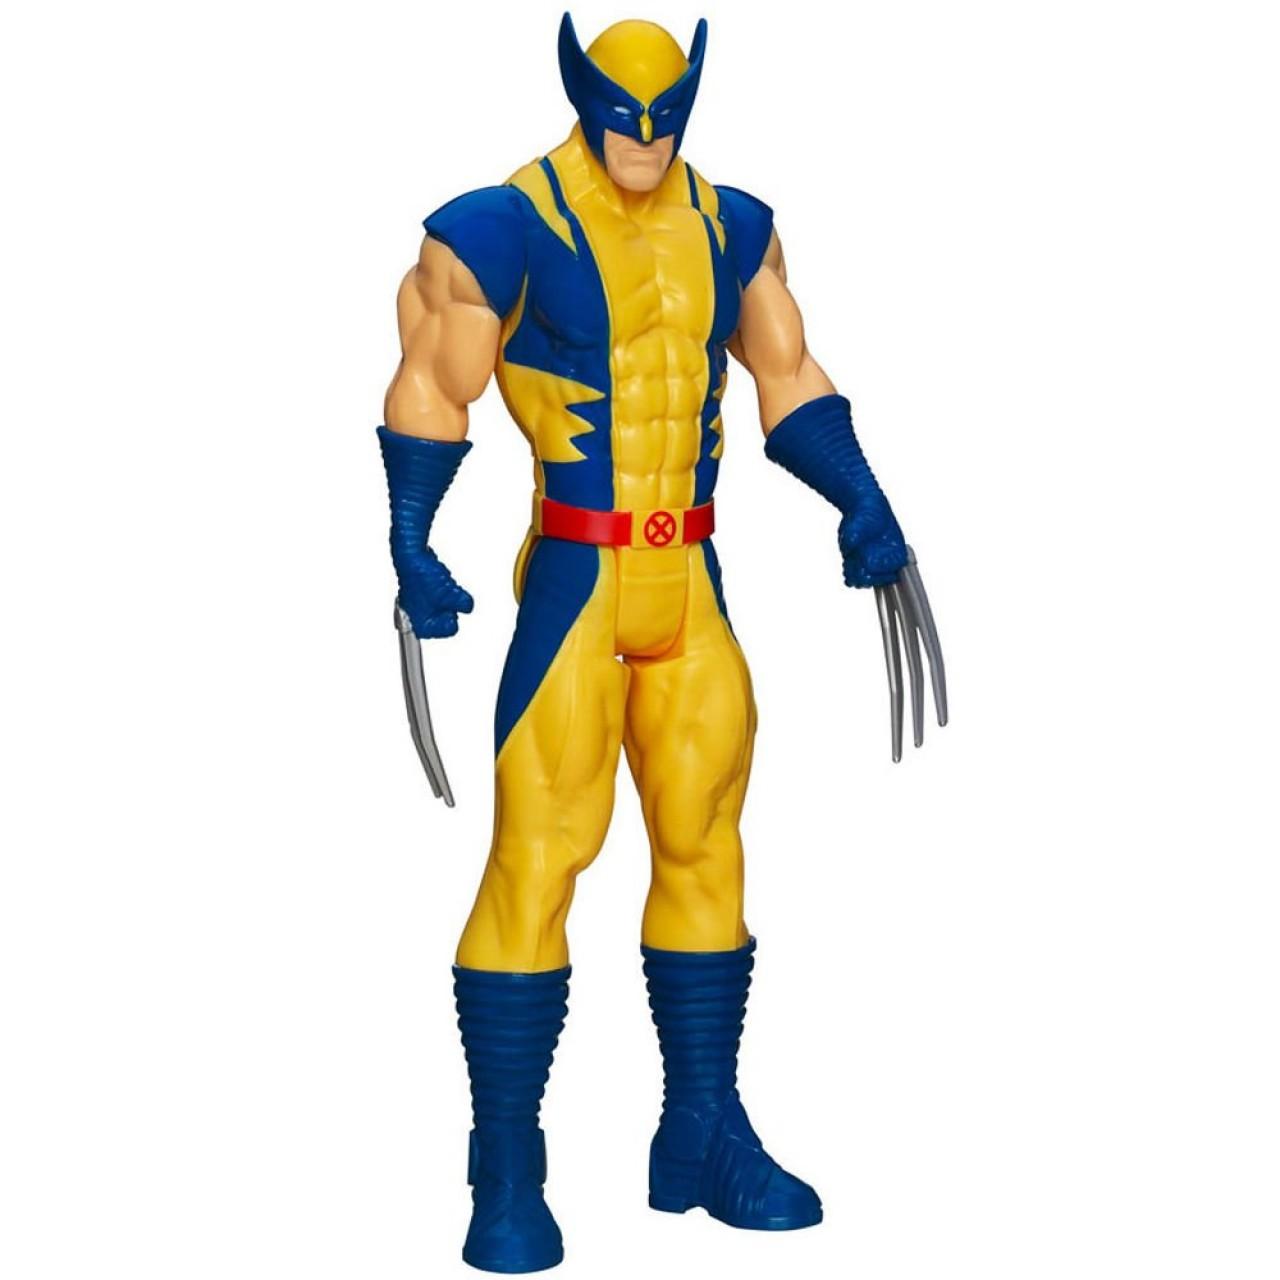 Фигурка Росомаха 30см A3321, серия Titan Hero от Hasbro (Marvel Wolverine)